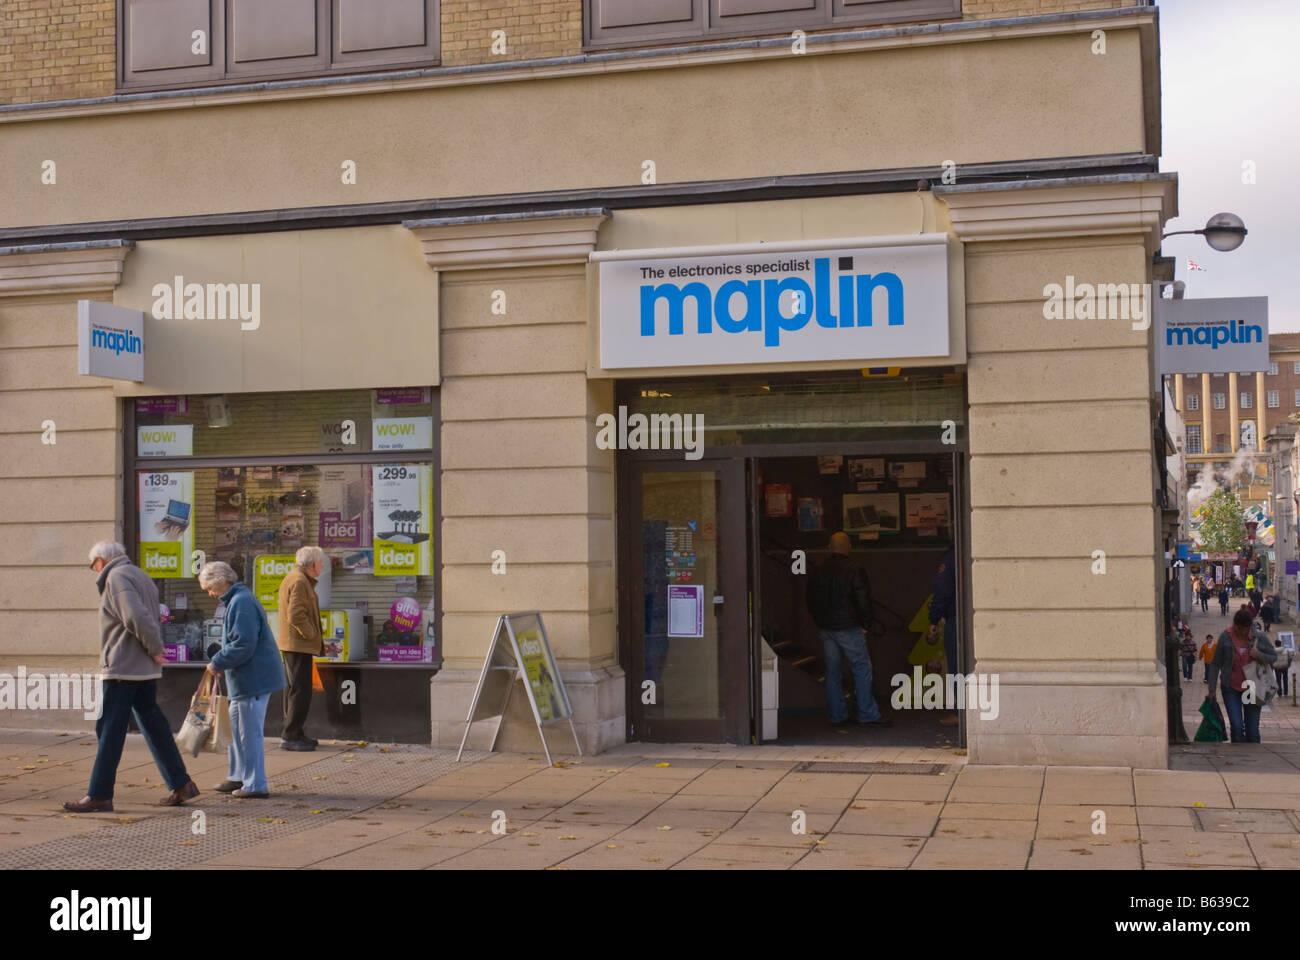 Maplin the electronics specialist shop store in Norwich,Norfolk,Uk - Stock Image